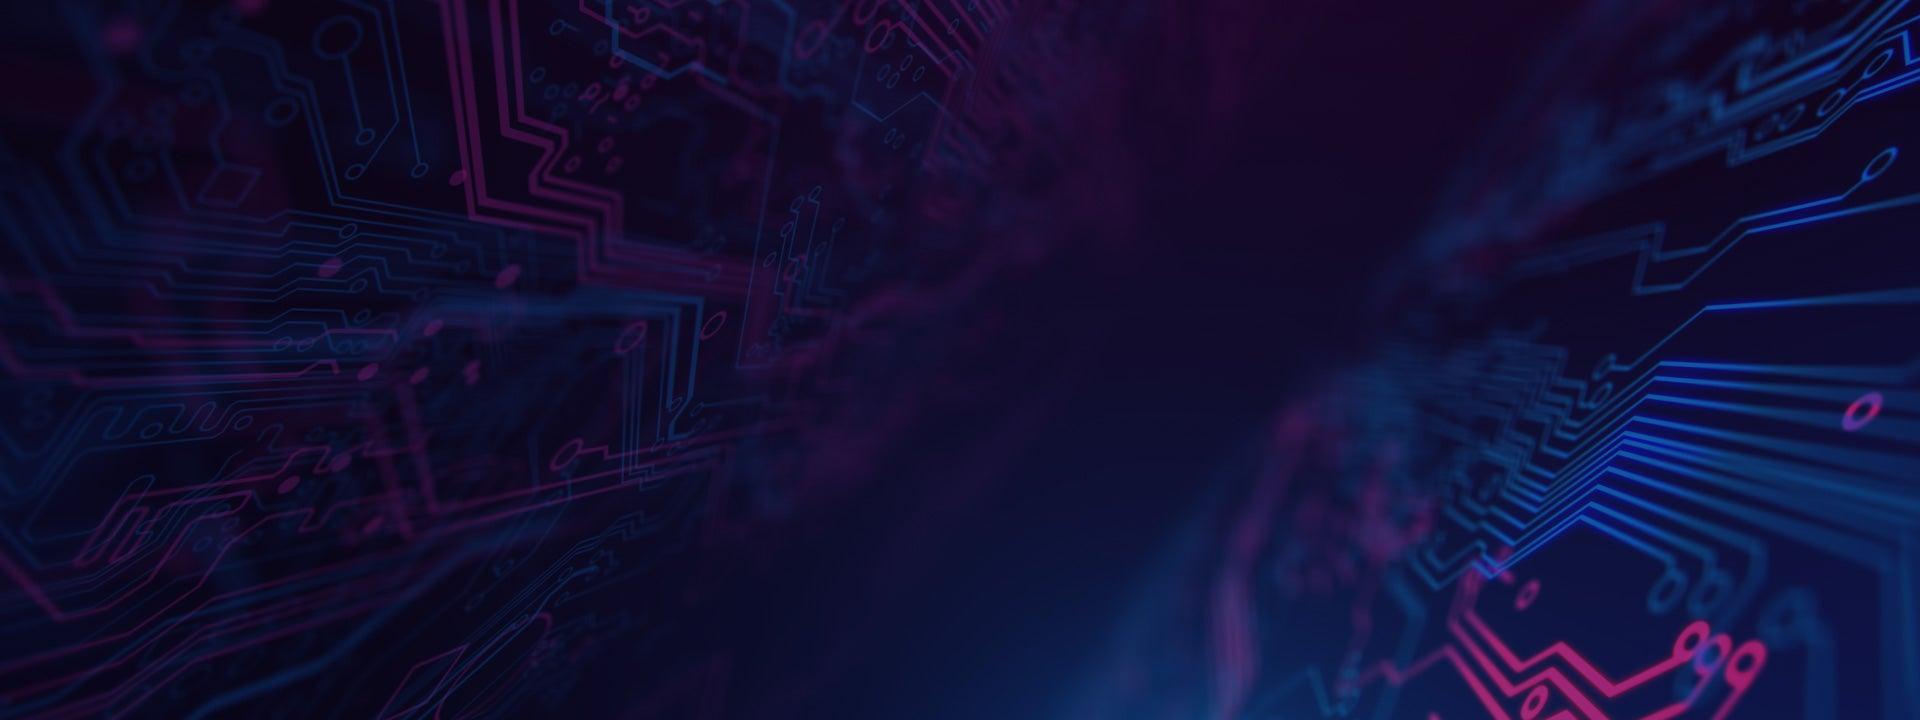 DataRobot Provides Elite Integration with Snowflake Partner Connect Background 1